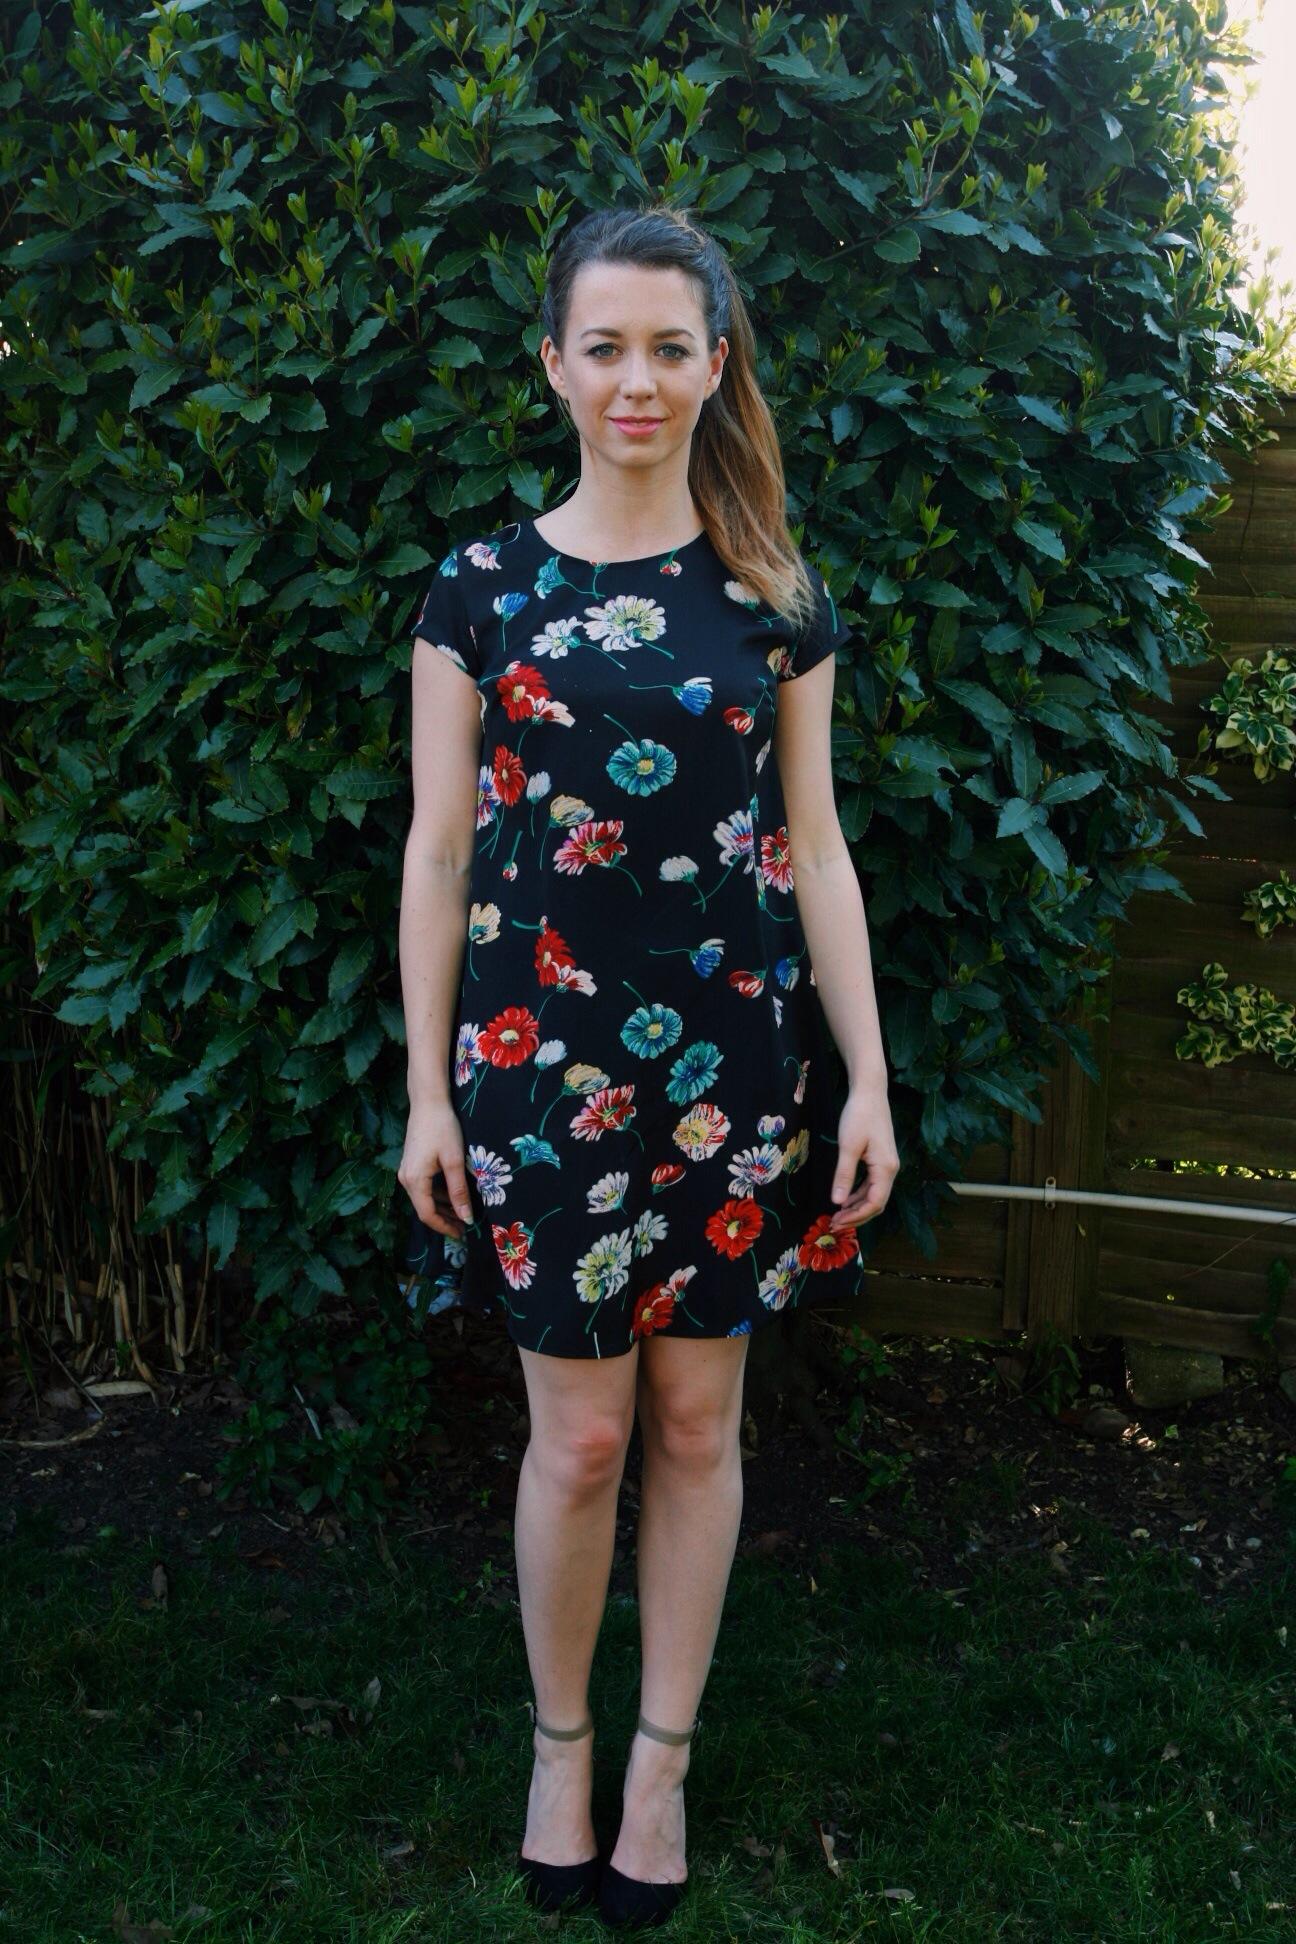 Summer dresses haul